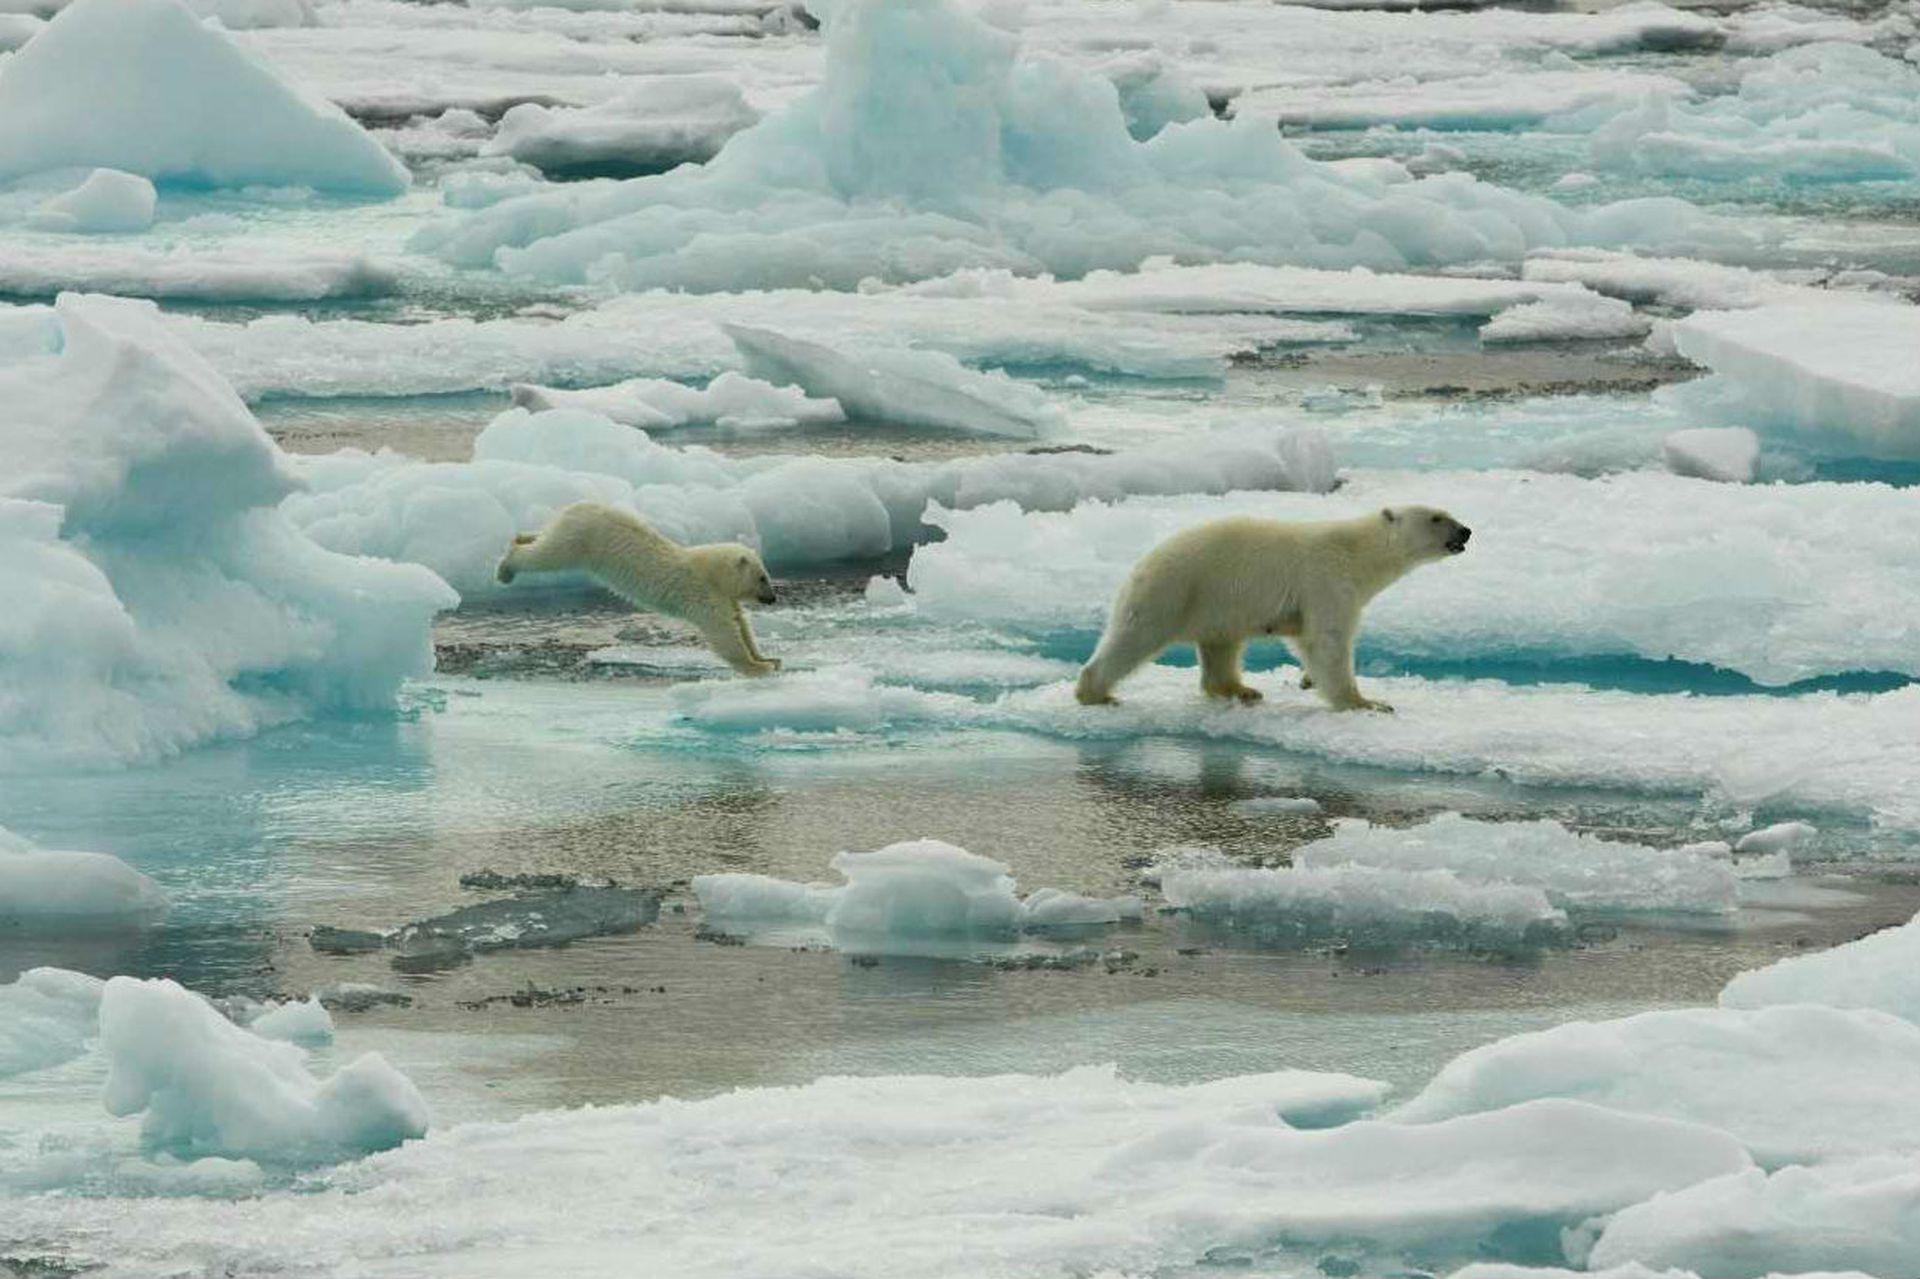 Los osos polares están en peligro